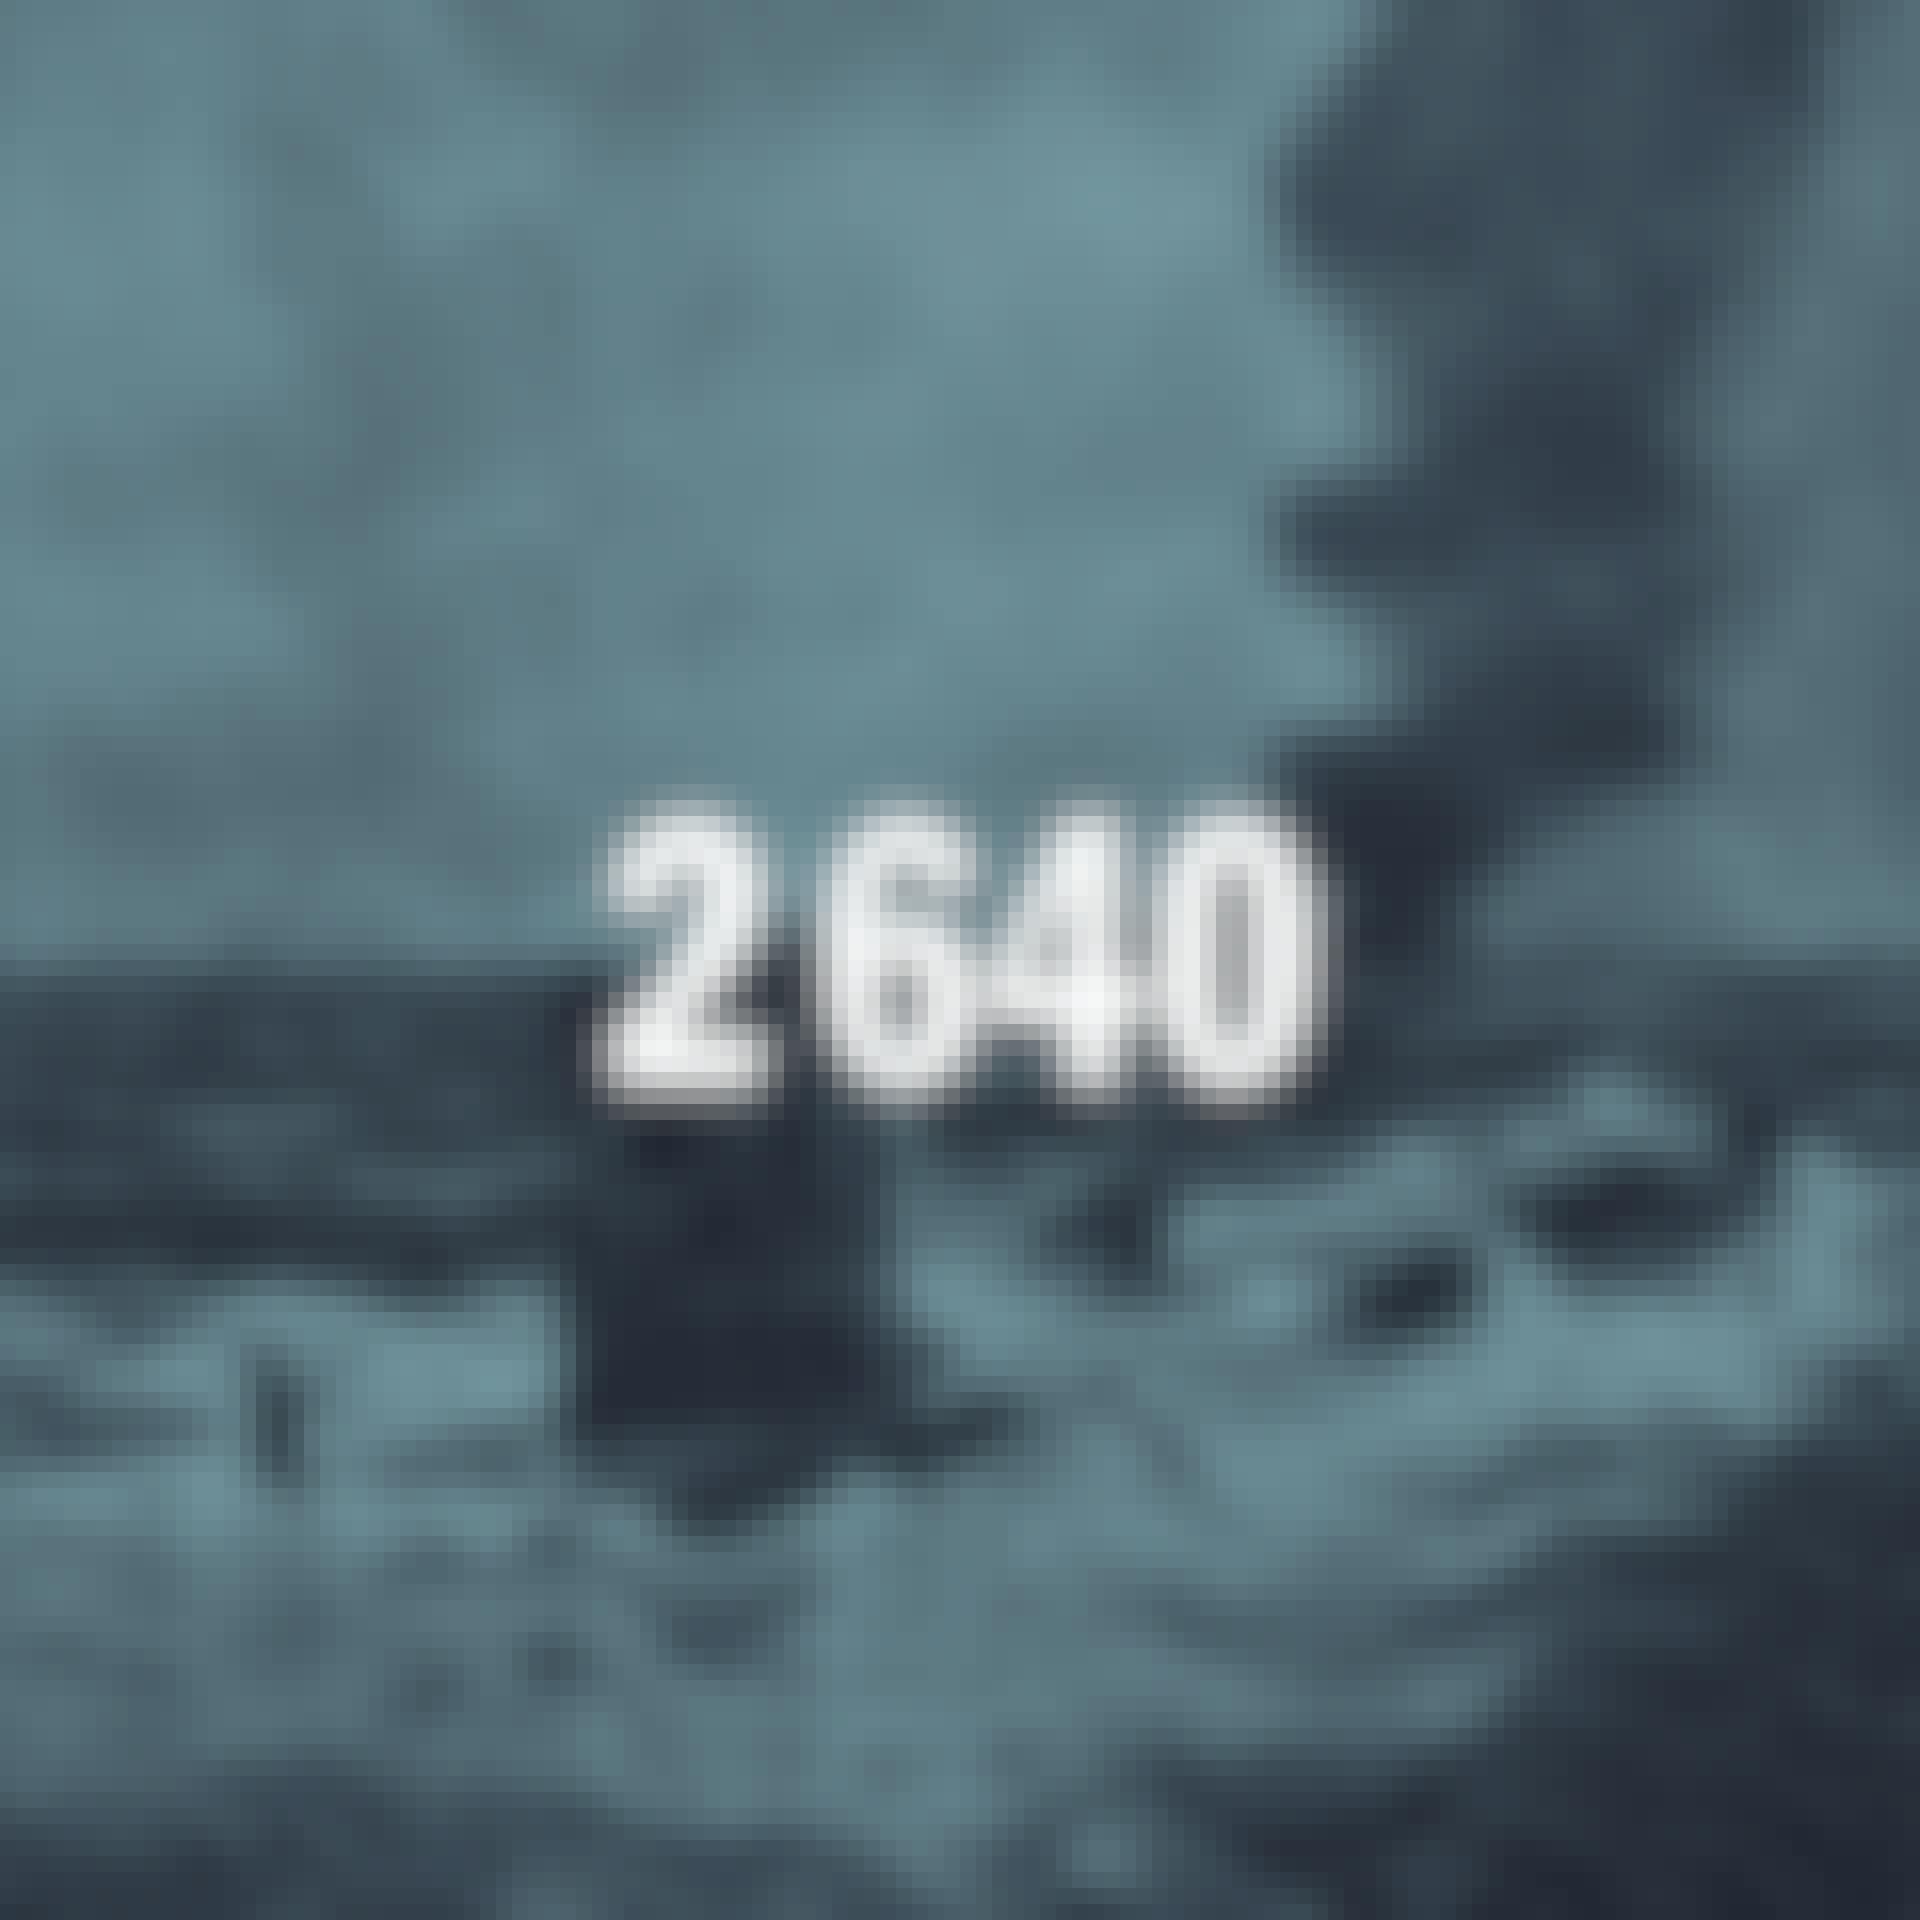 Allierede konvojer tab skibe